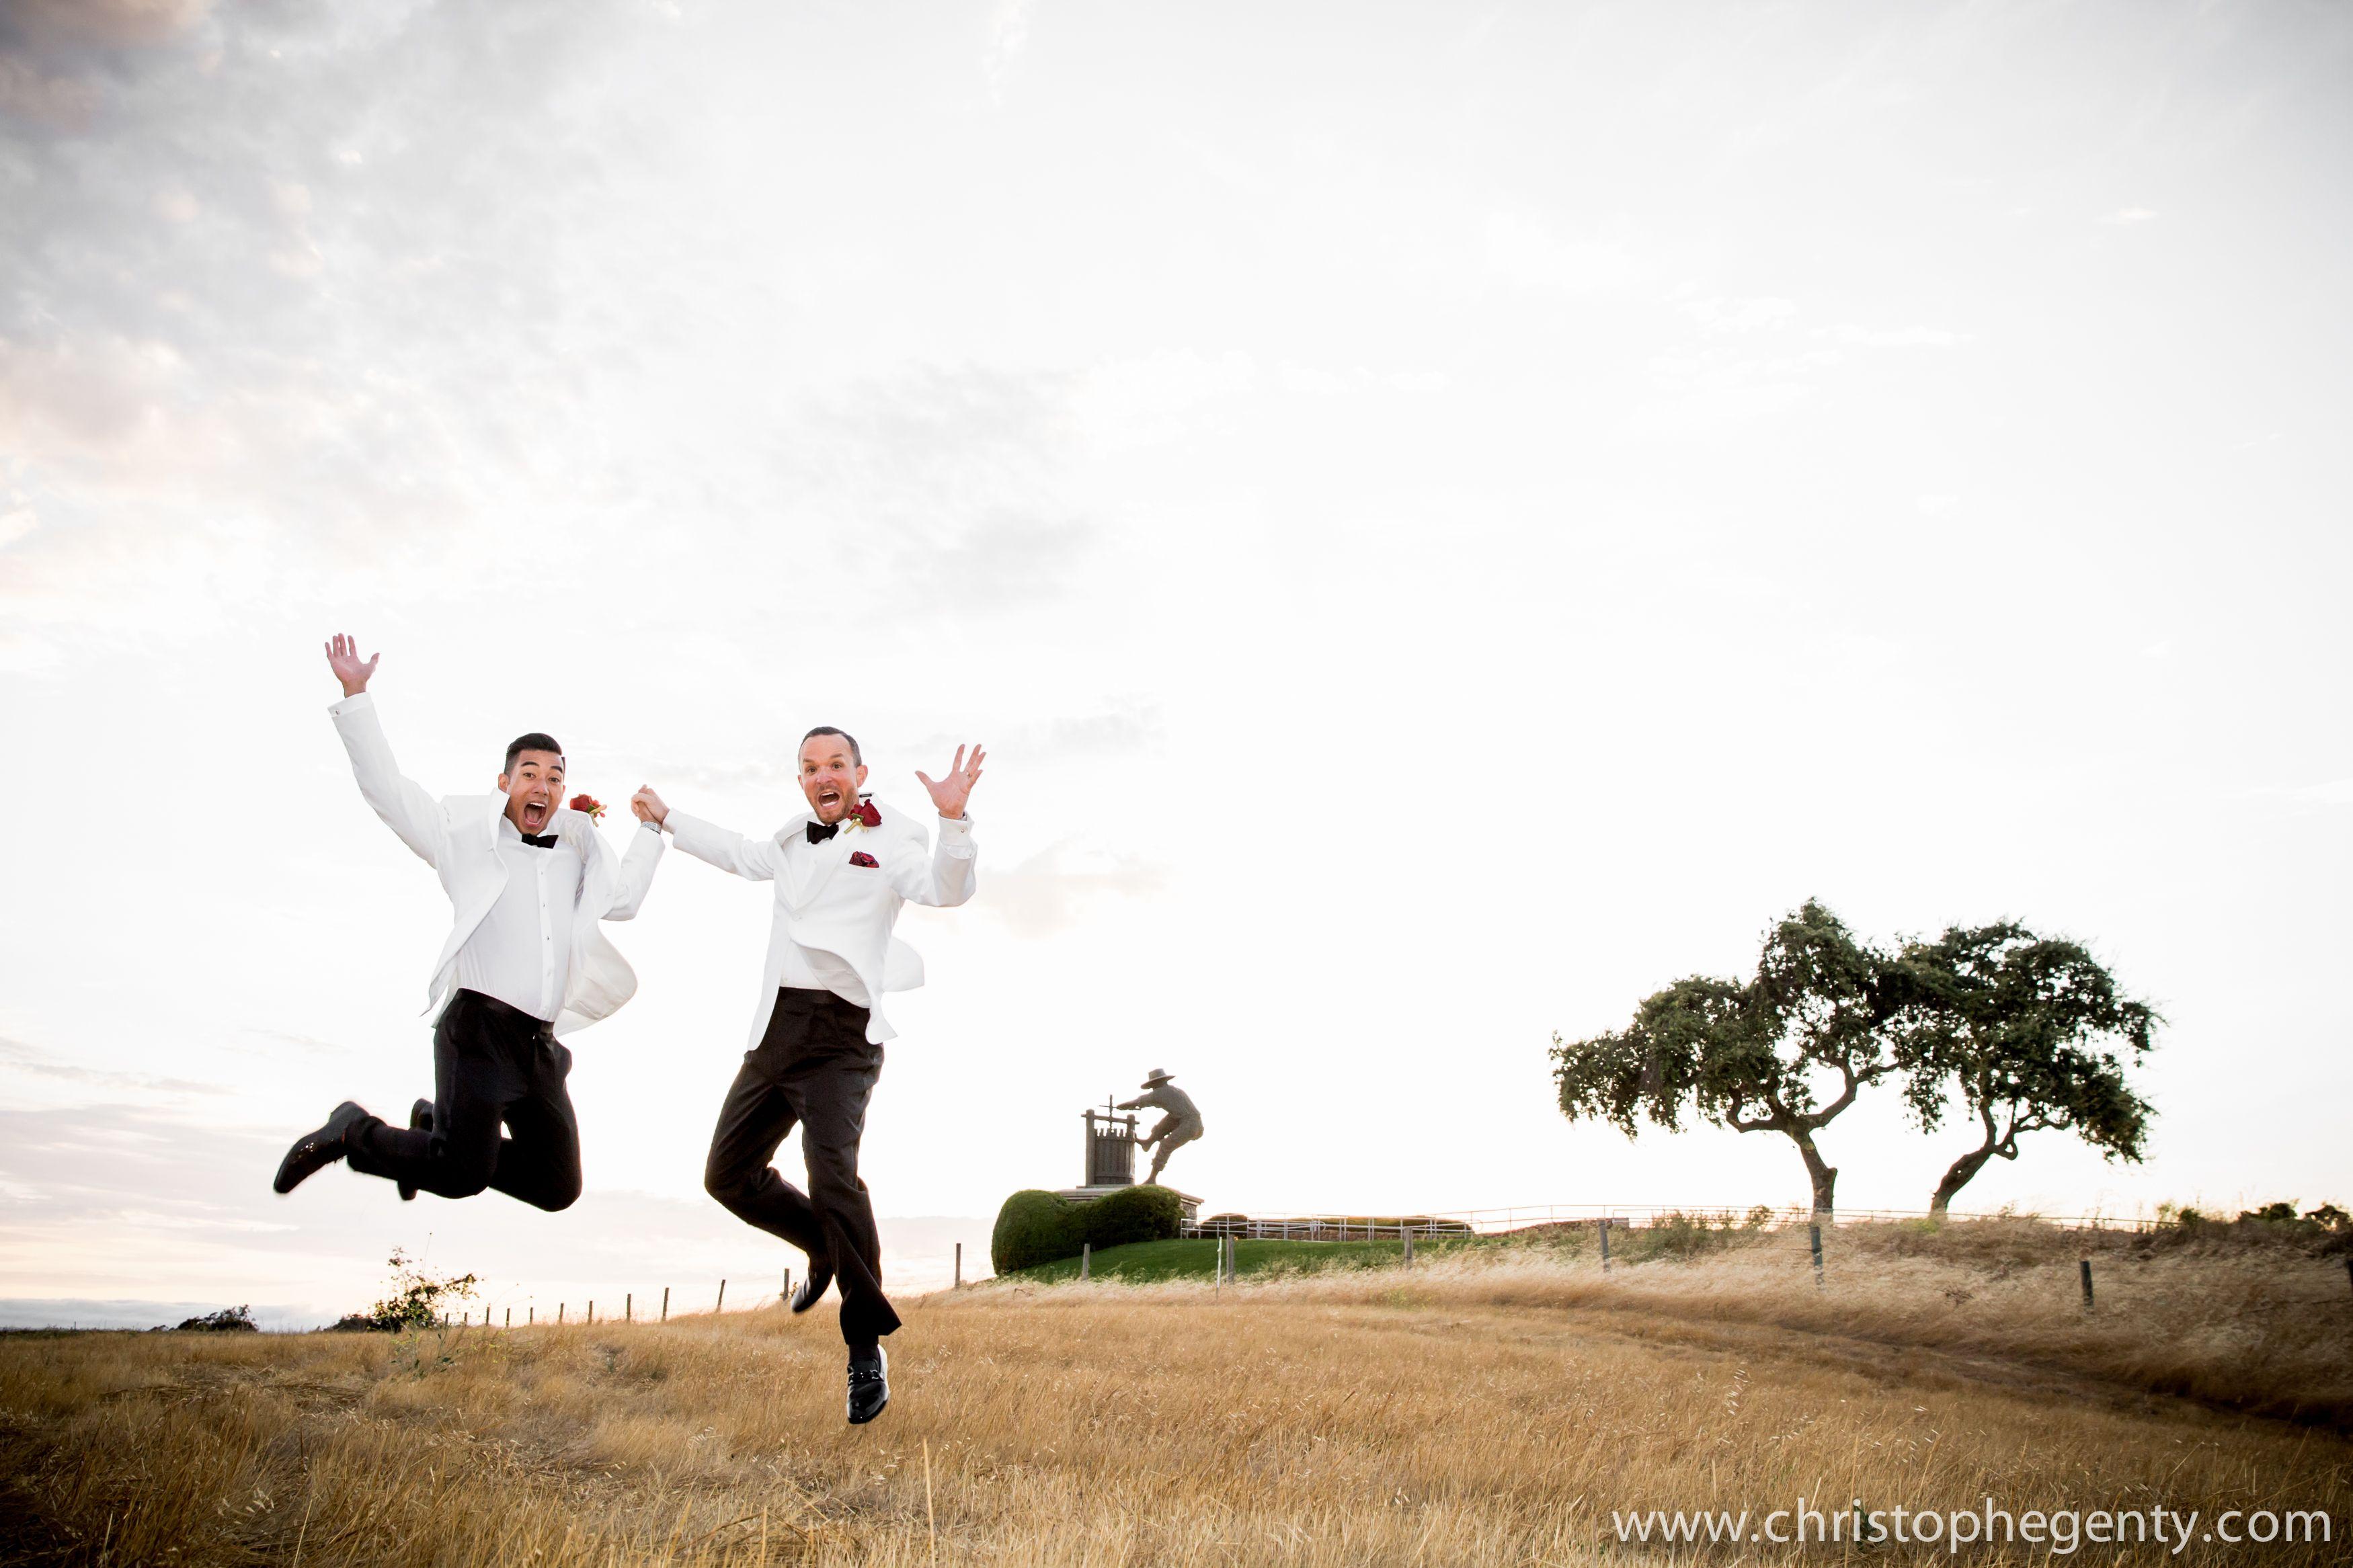 Jumping with joy wedding photo | Julius and Kristian\'s vineyard ...